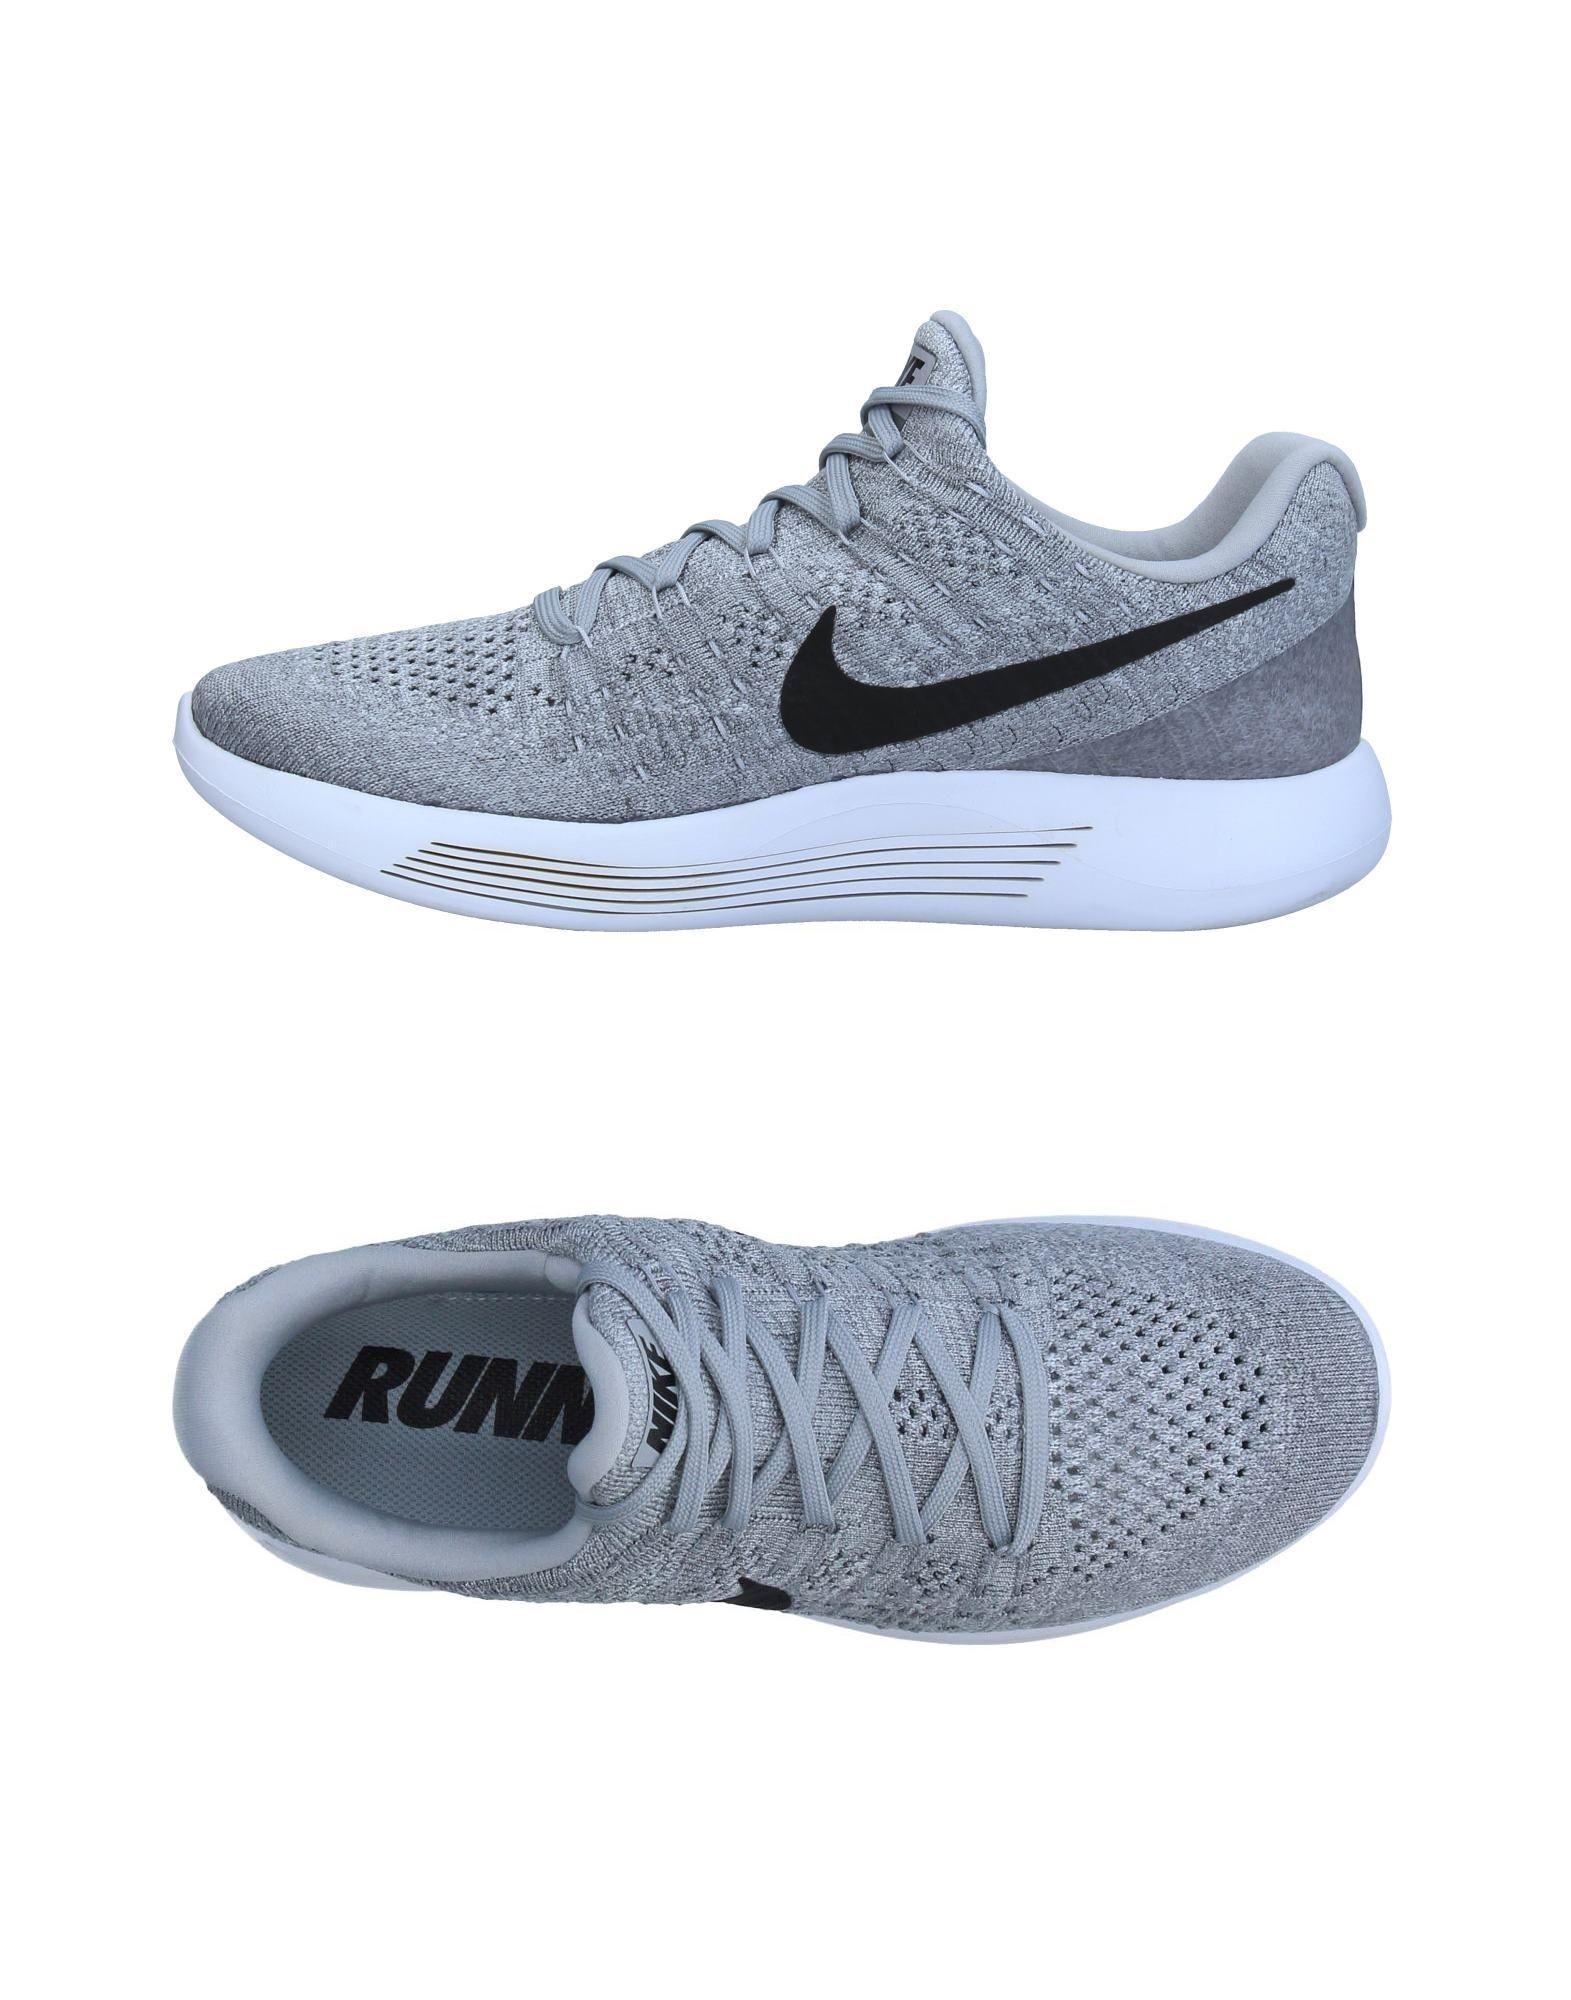 Nike - Sneakers - Nike Men Nike Sneakers online on  Australia - 11357751BI 11d794